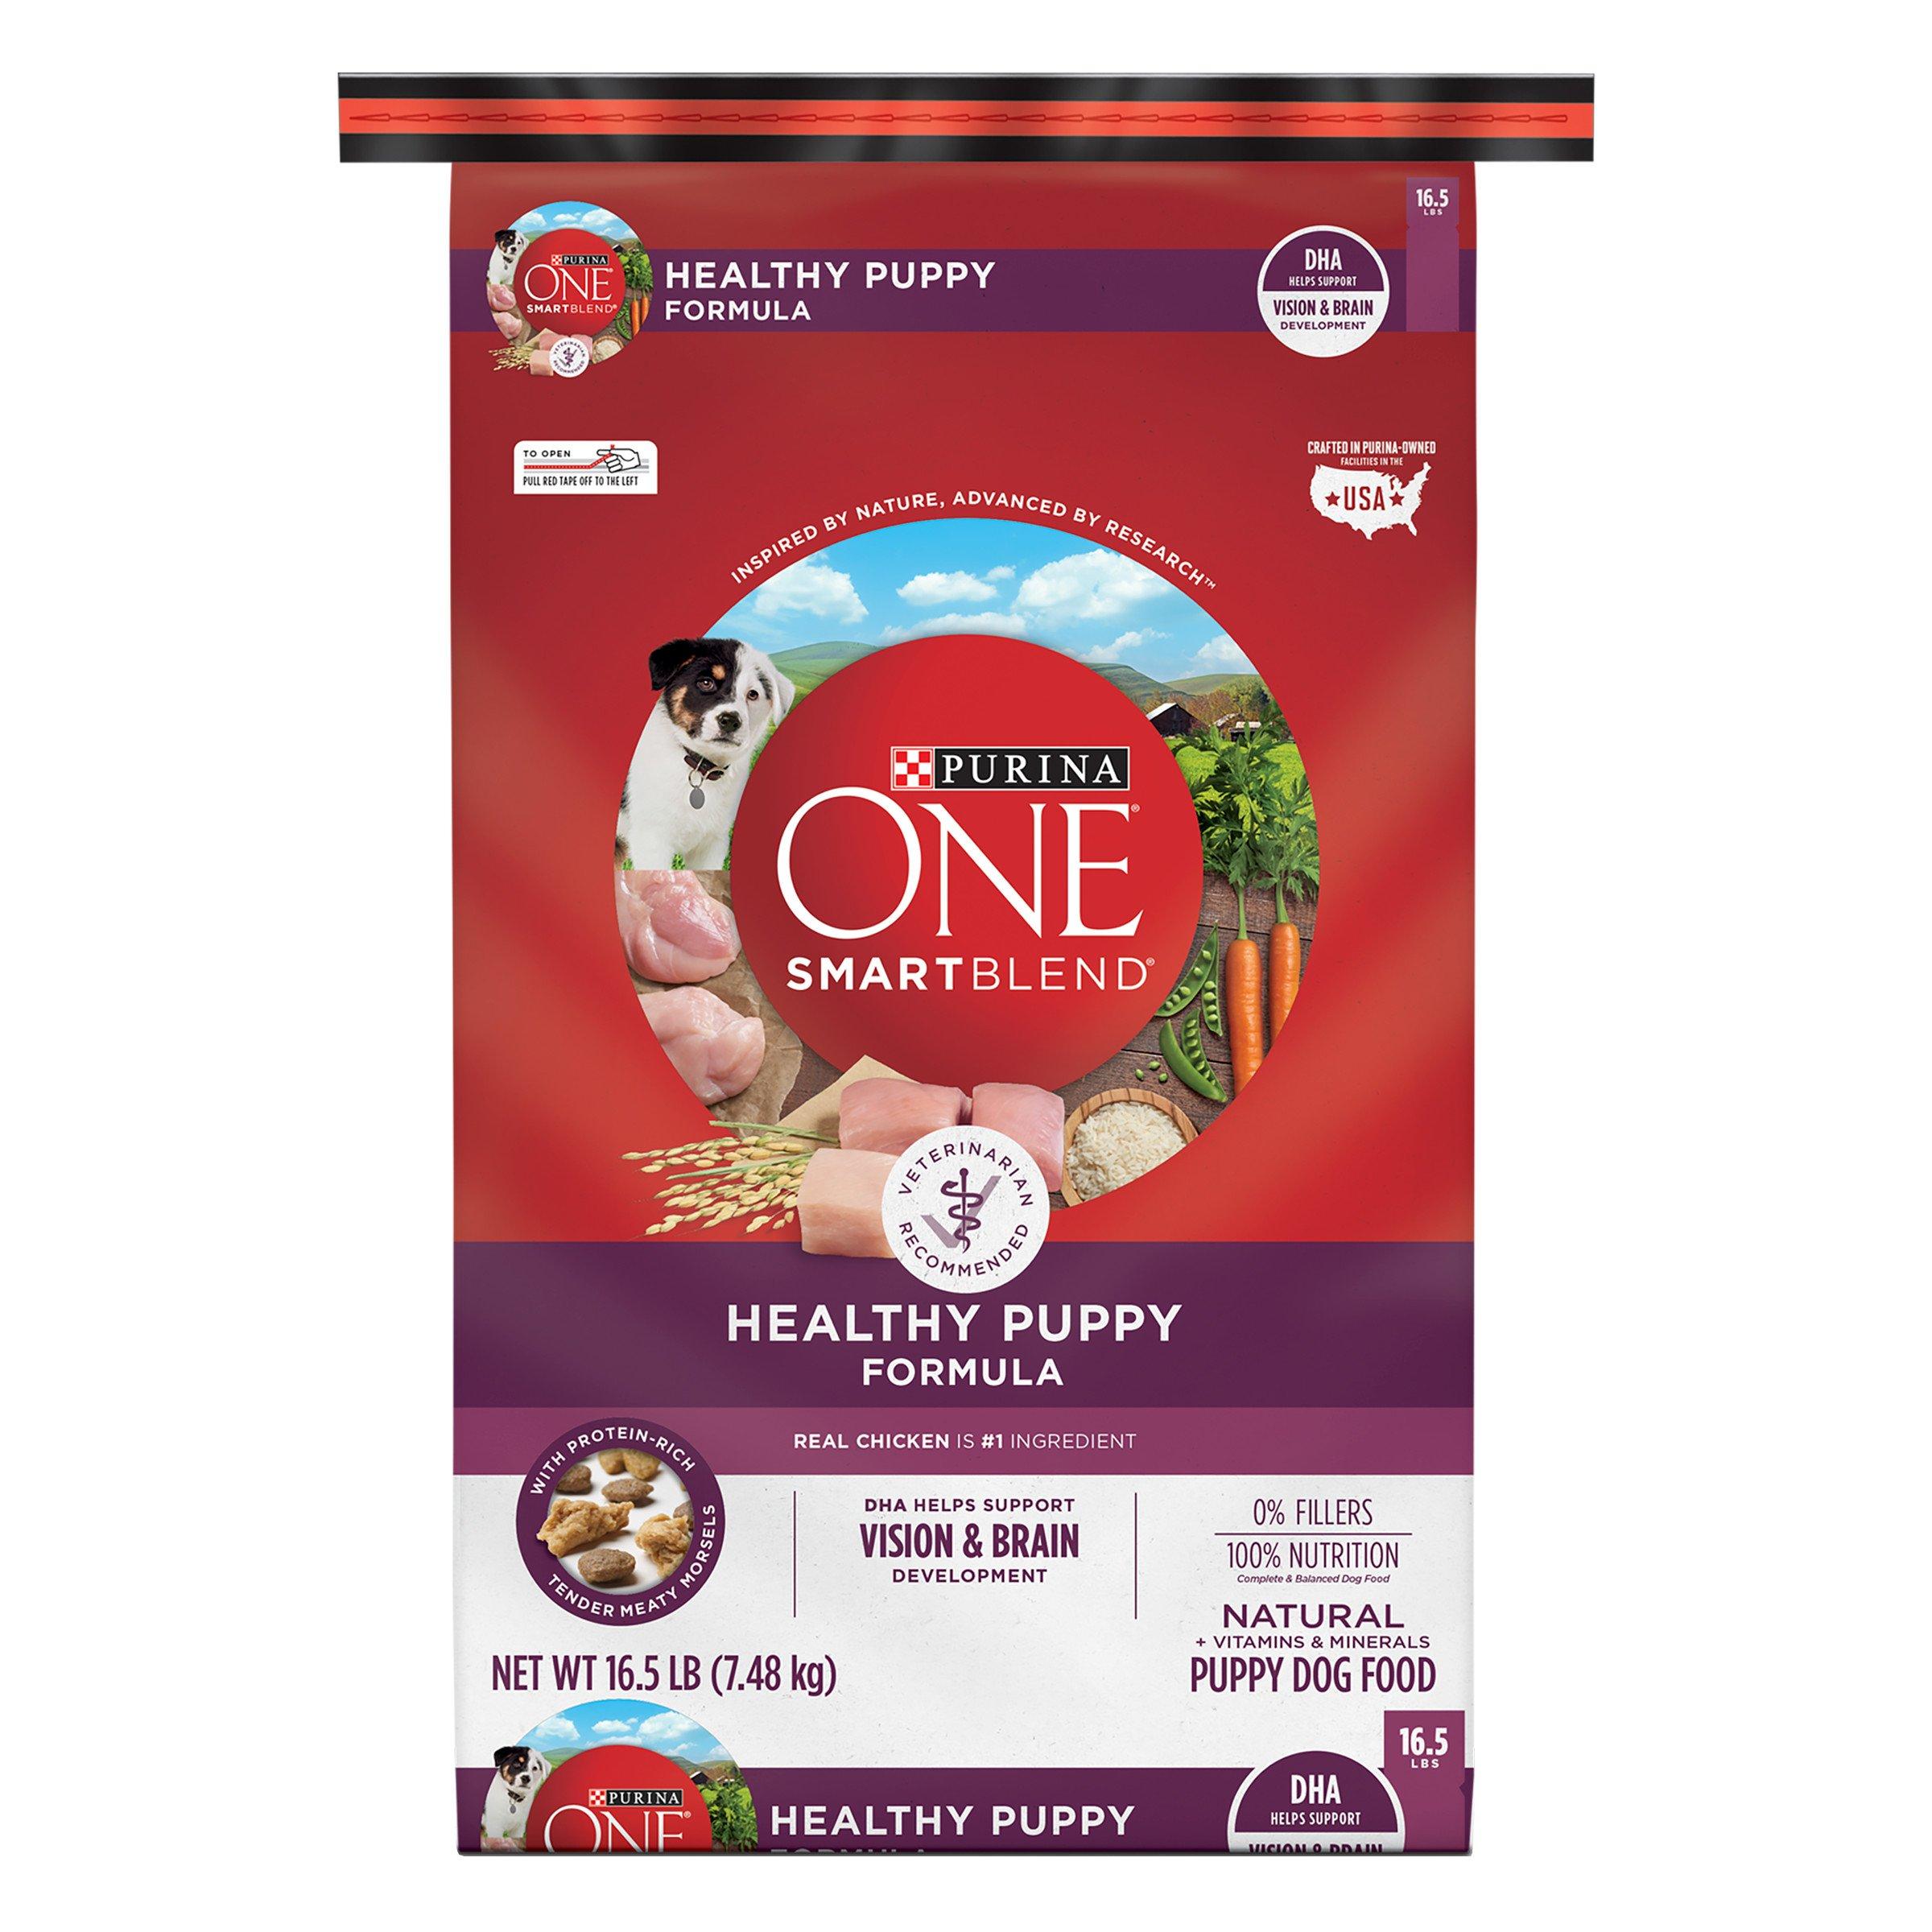 Purina ONE SmartBlend Natural Healthy Puppy Formula Dry Dog Food - 16.5 lb. Bag